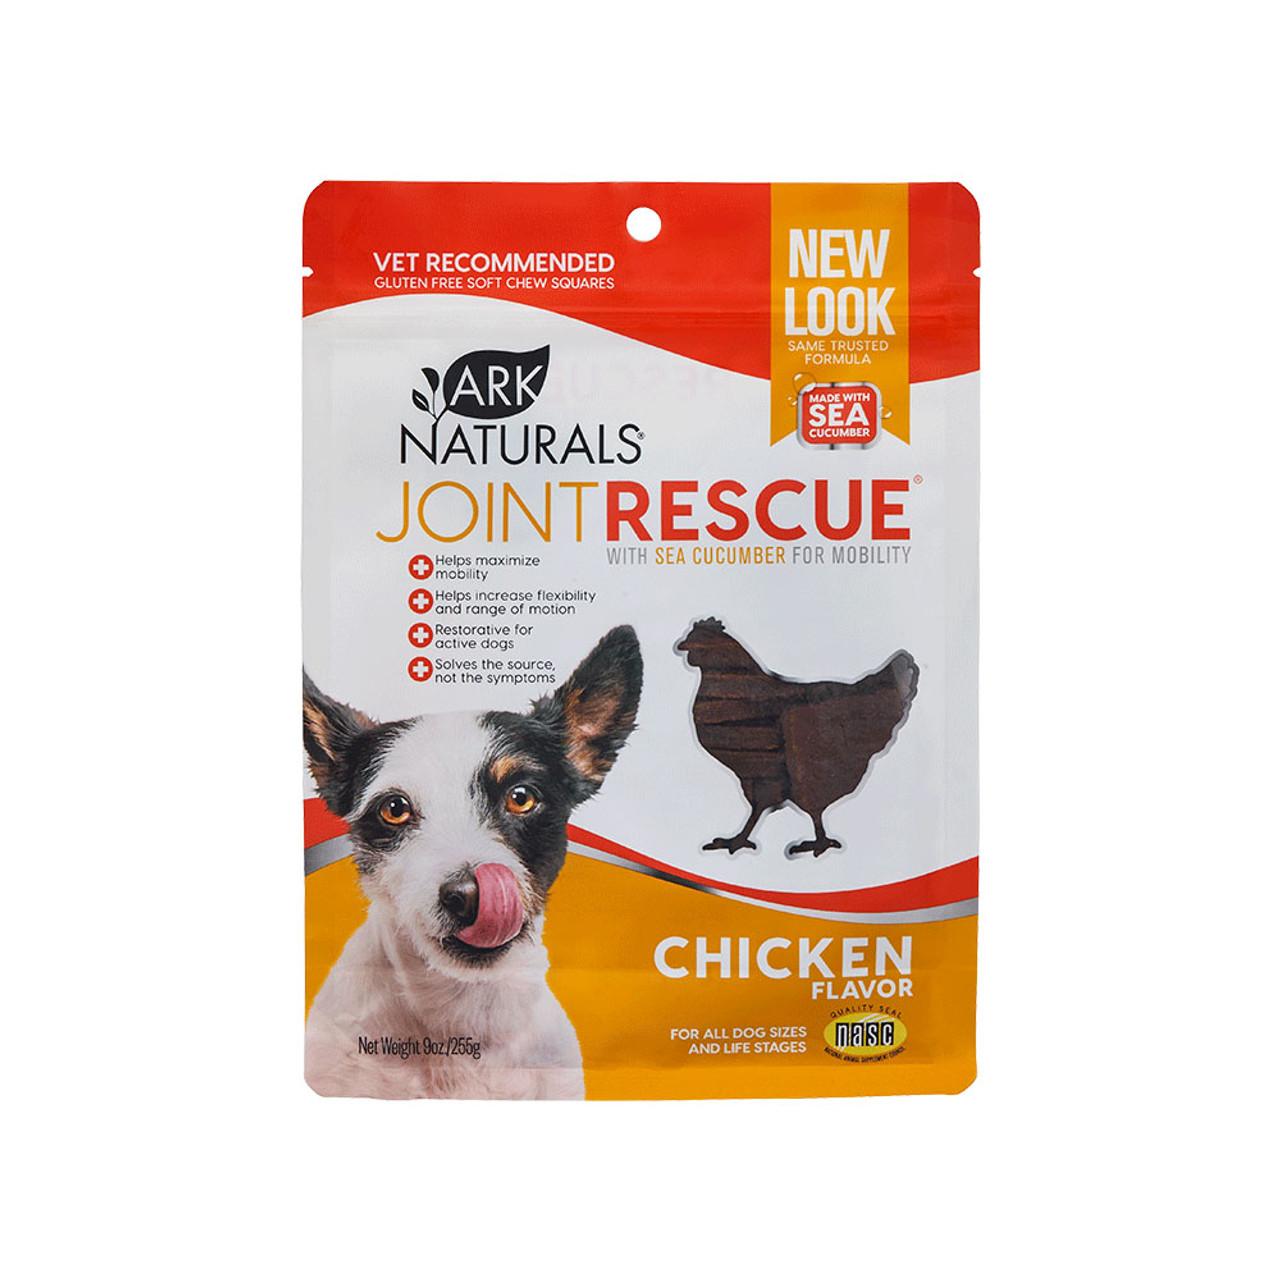 Ark Naturals Joint Rescue Chicken Flavor Dog Treats